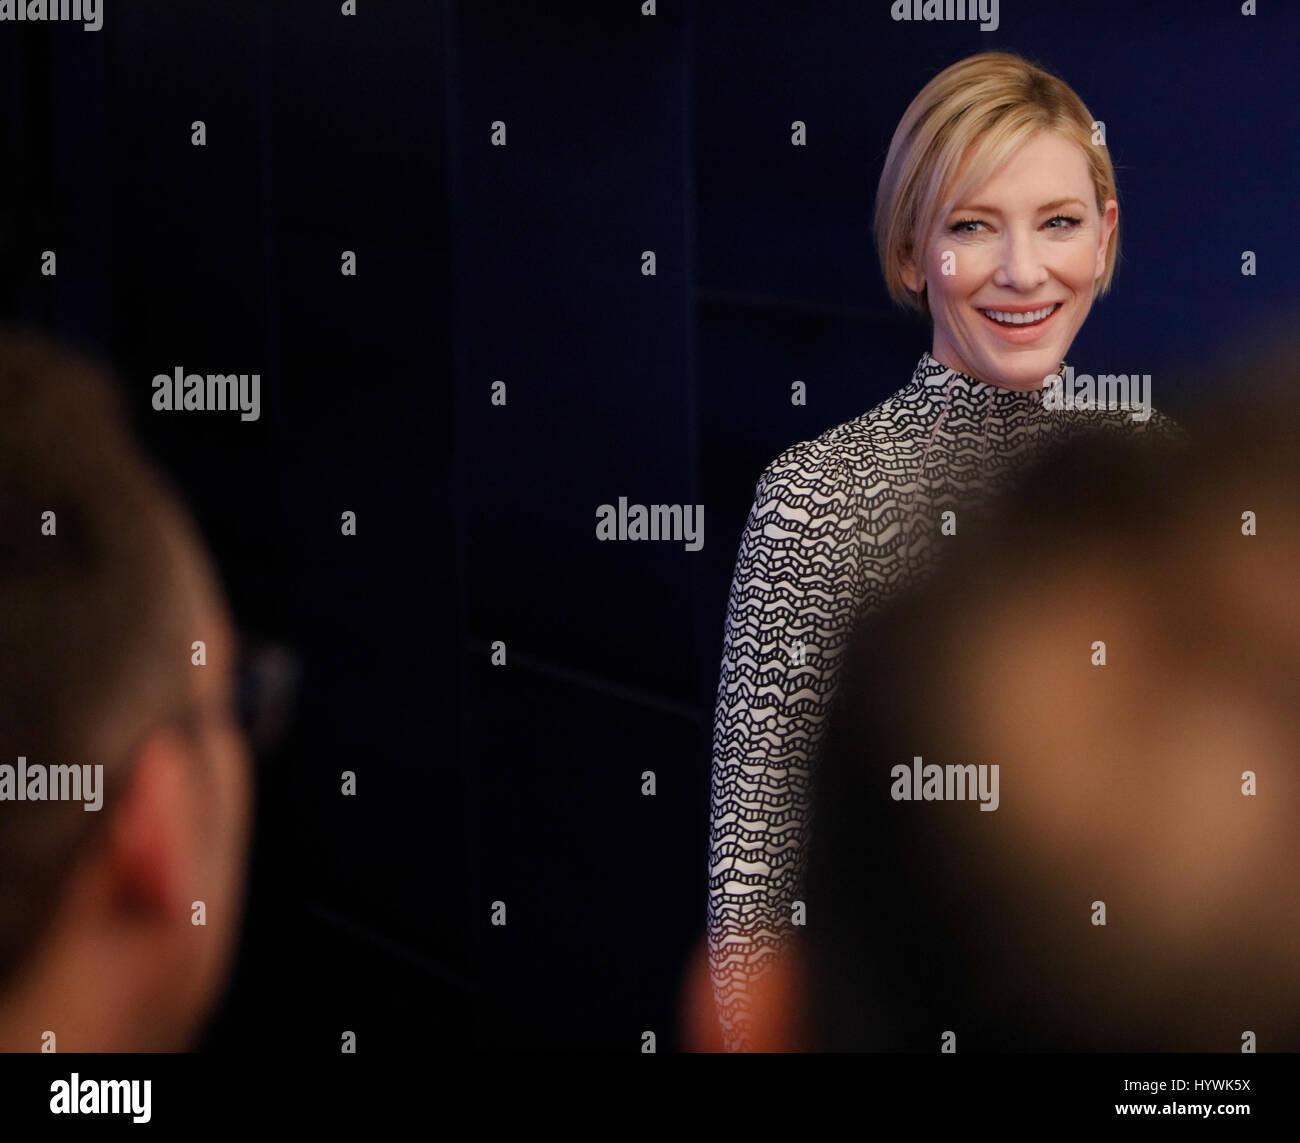 New York City, USA. Apr 26, 2017. Cate Blanchett assiste à la projection du Festival du film de Tribeca manifeste Photo Stock